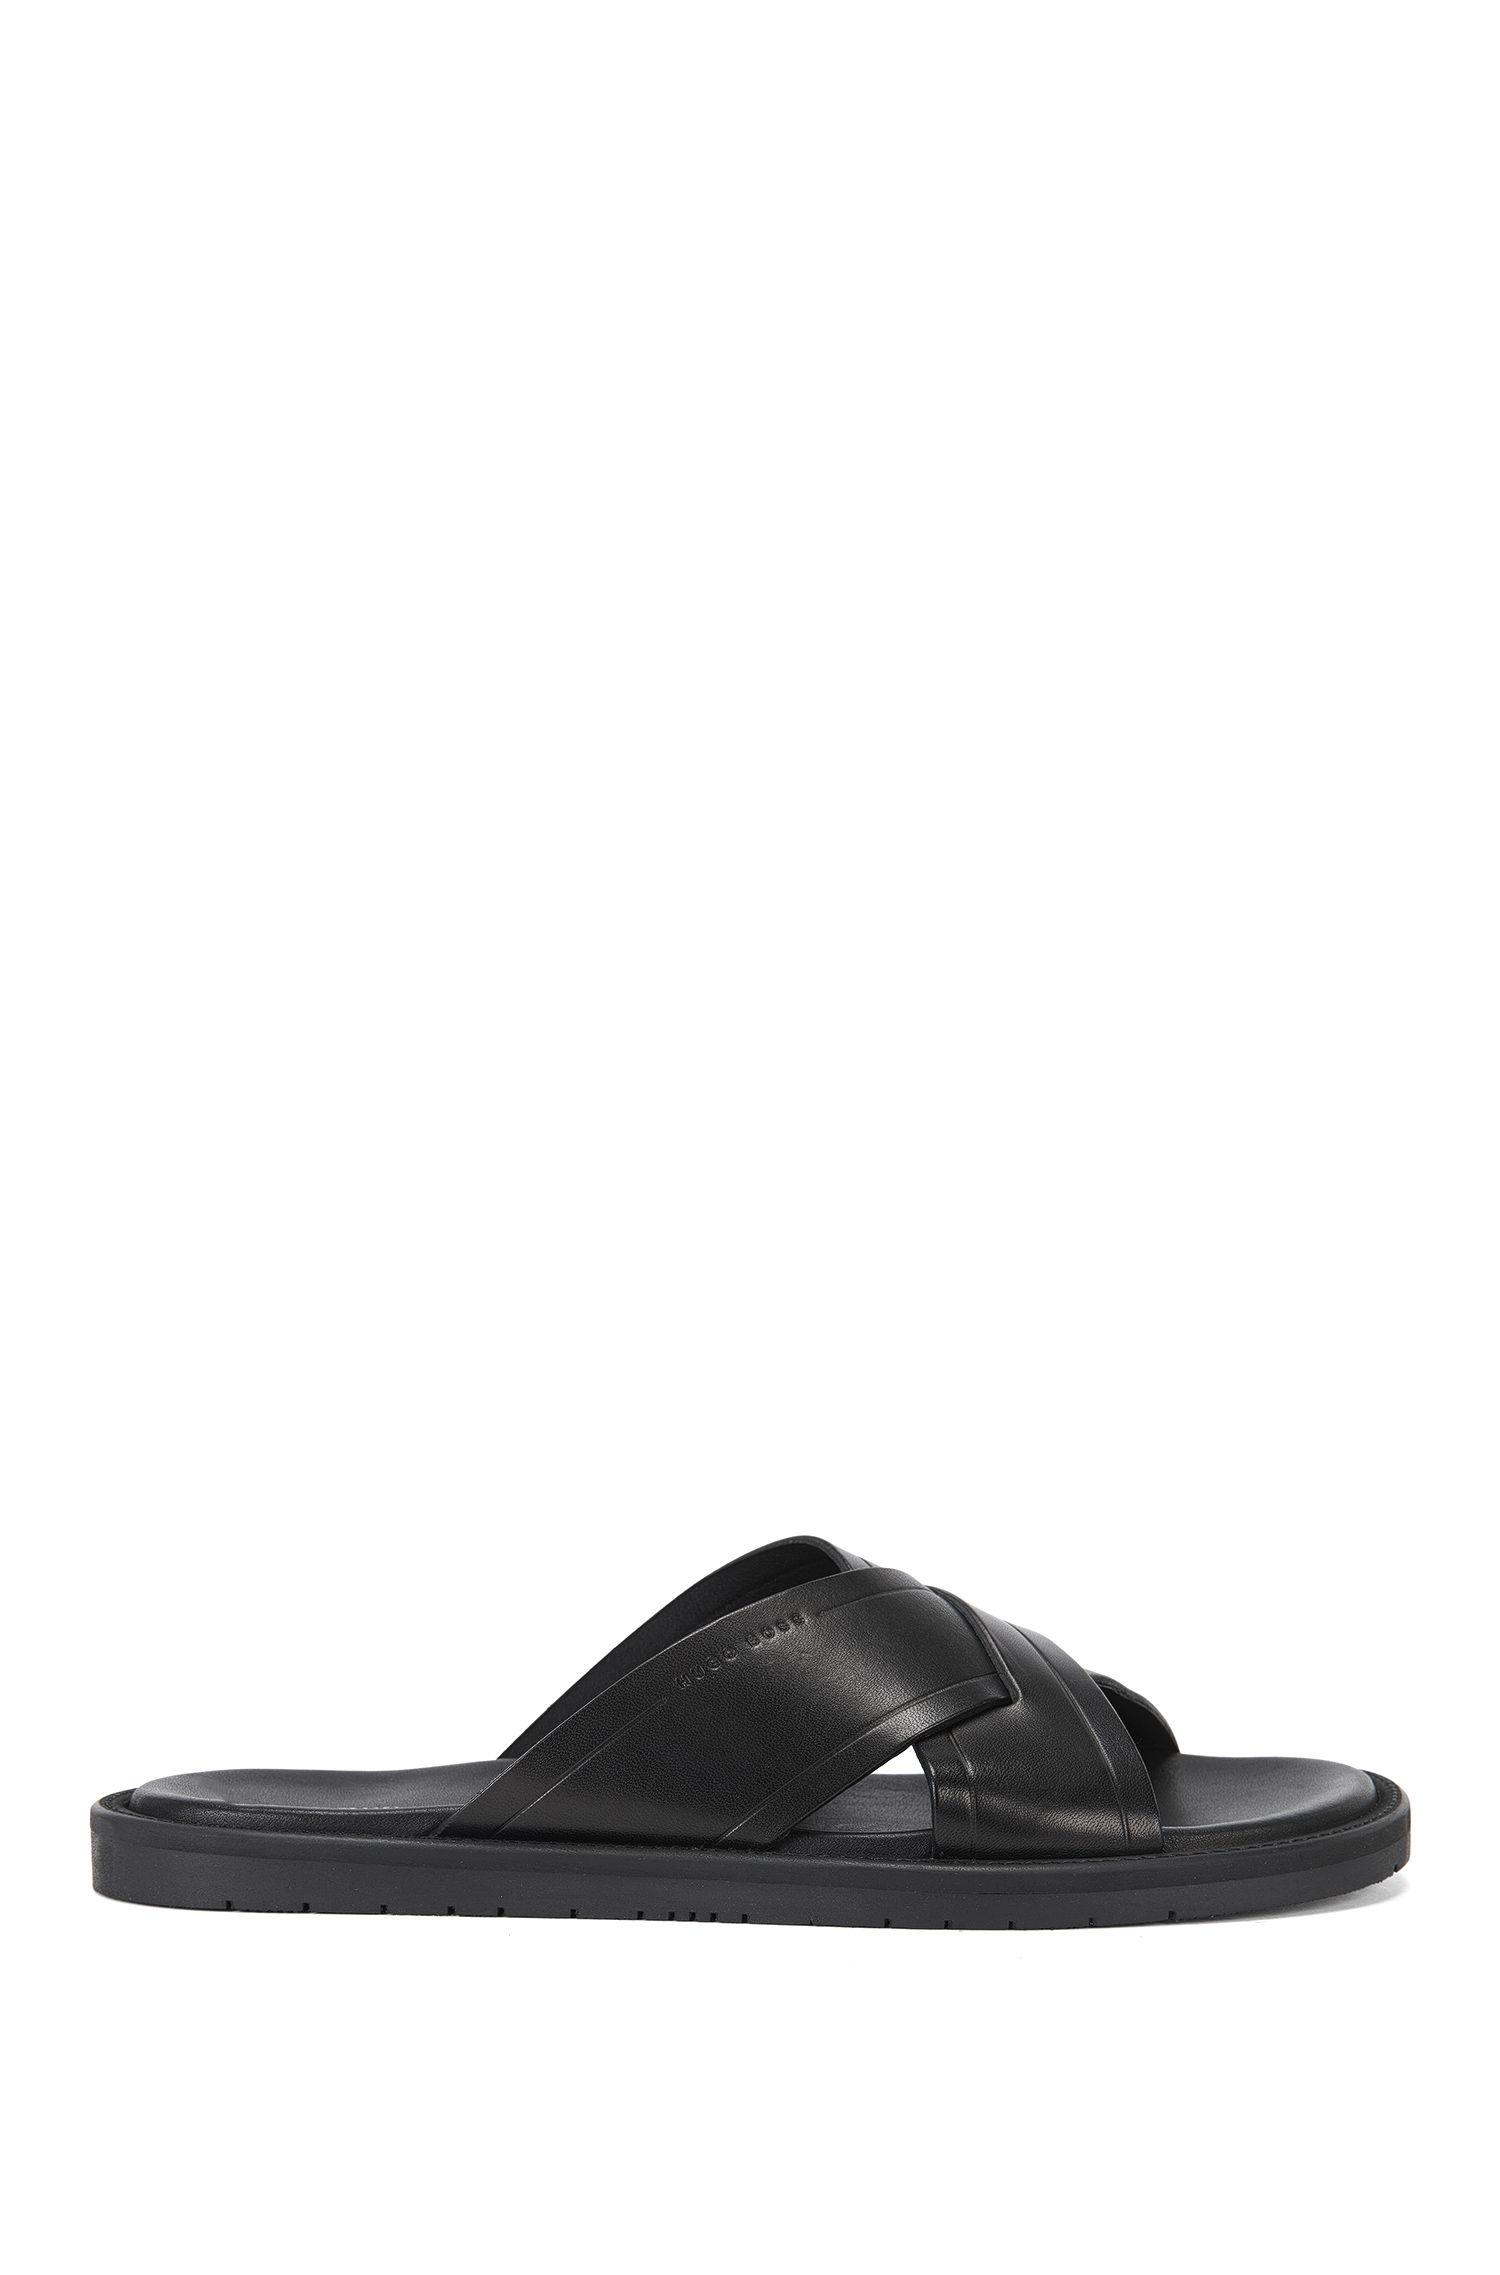 Unifarbene Sandalen aus Leder: 'Hamptons_Slid_ltcc'